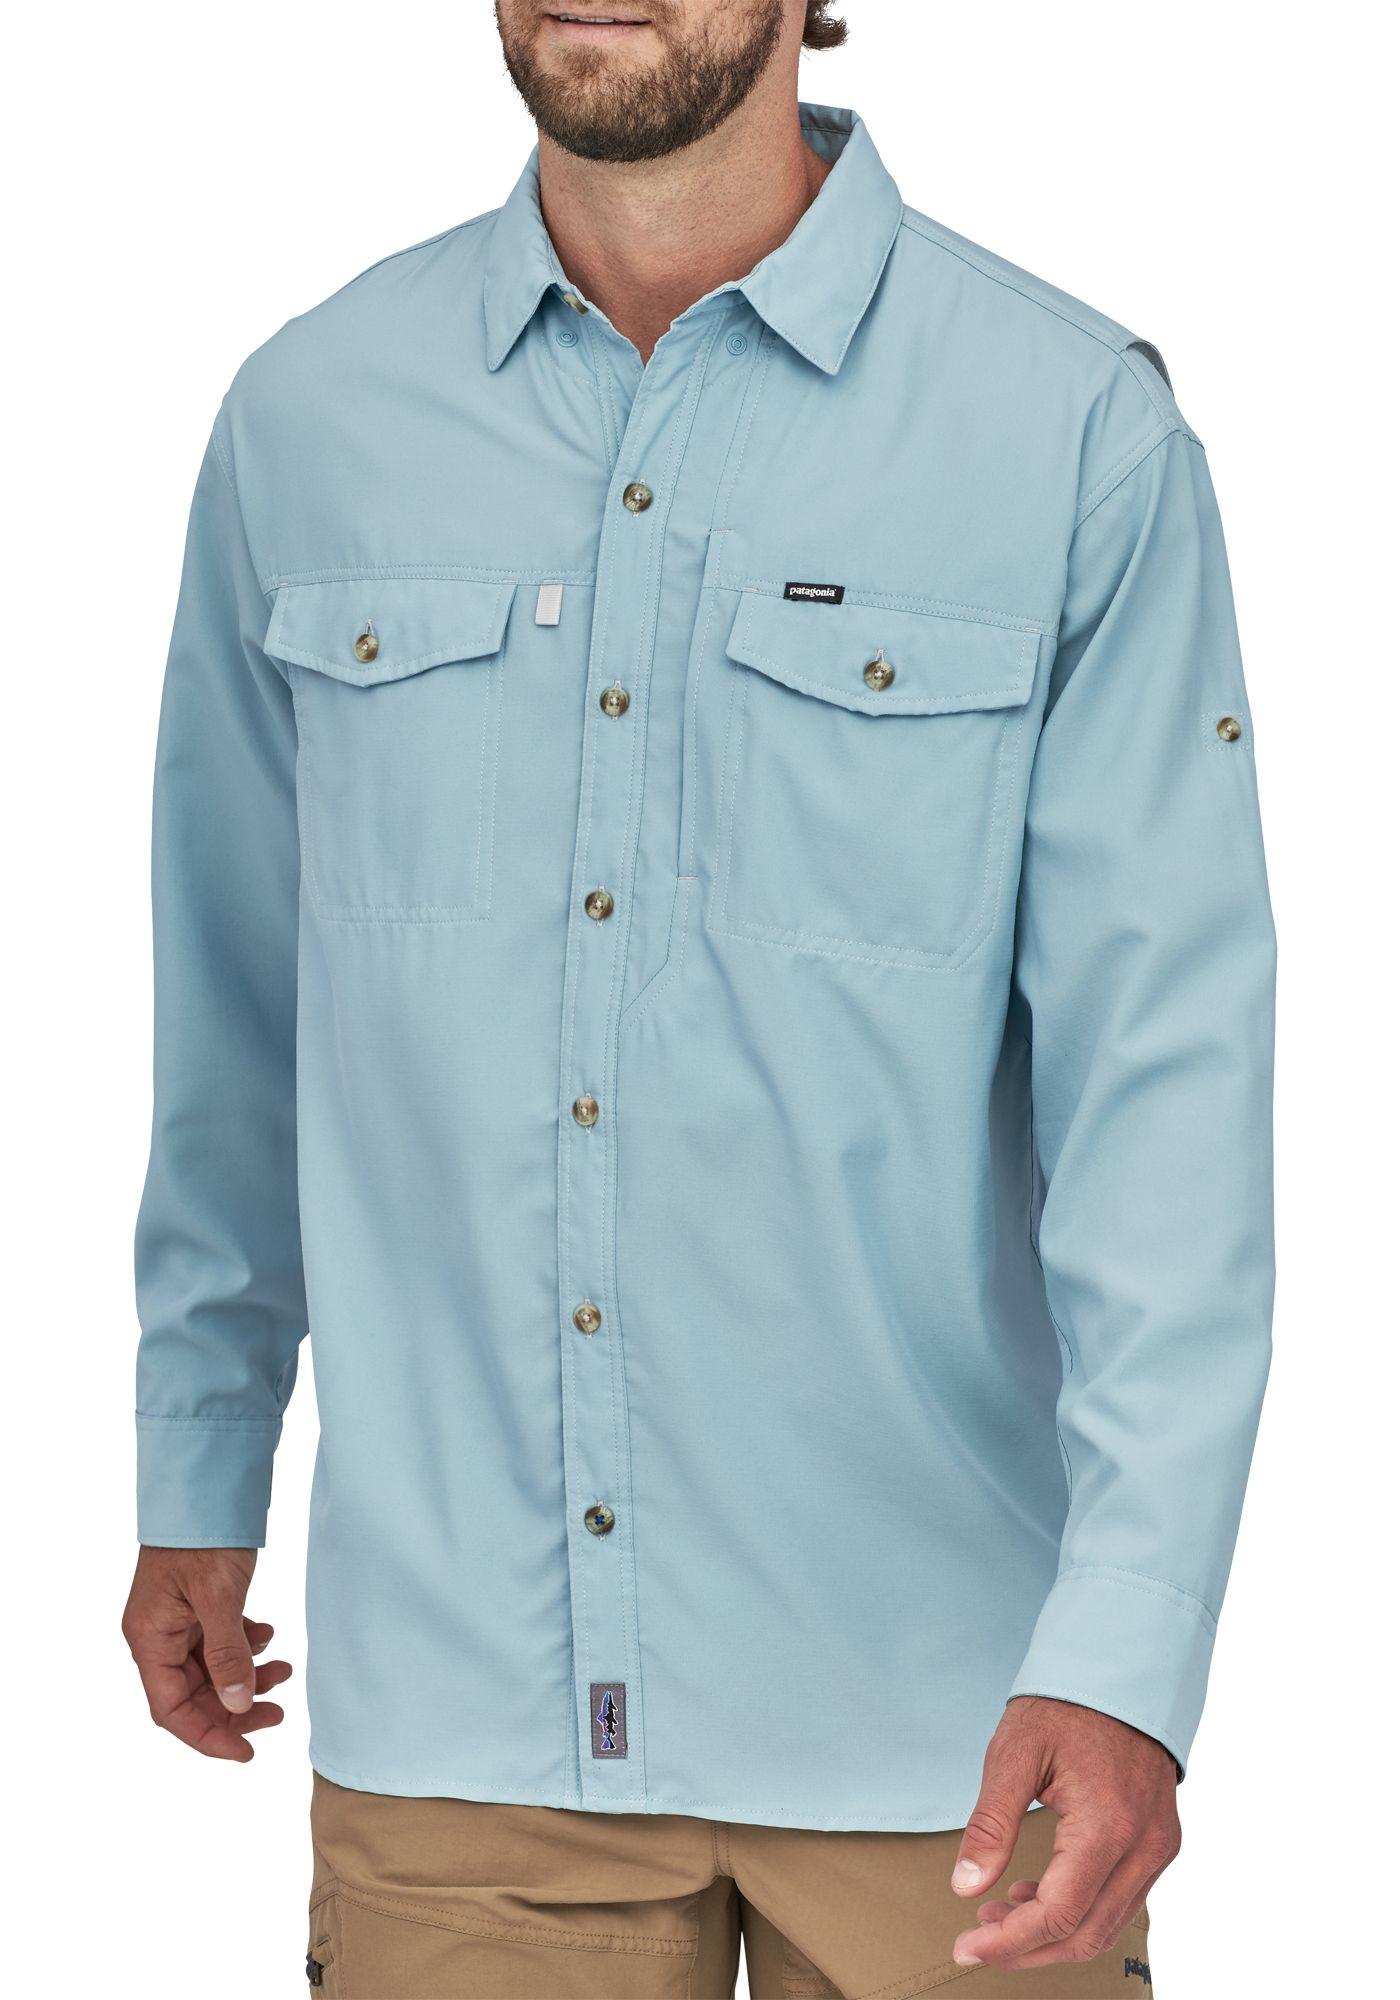 Patagonia Men's Sol Patrol Long Sleeve Button Down Shirt